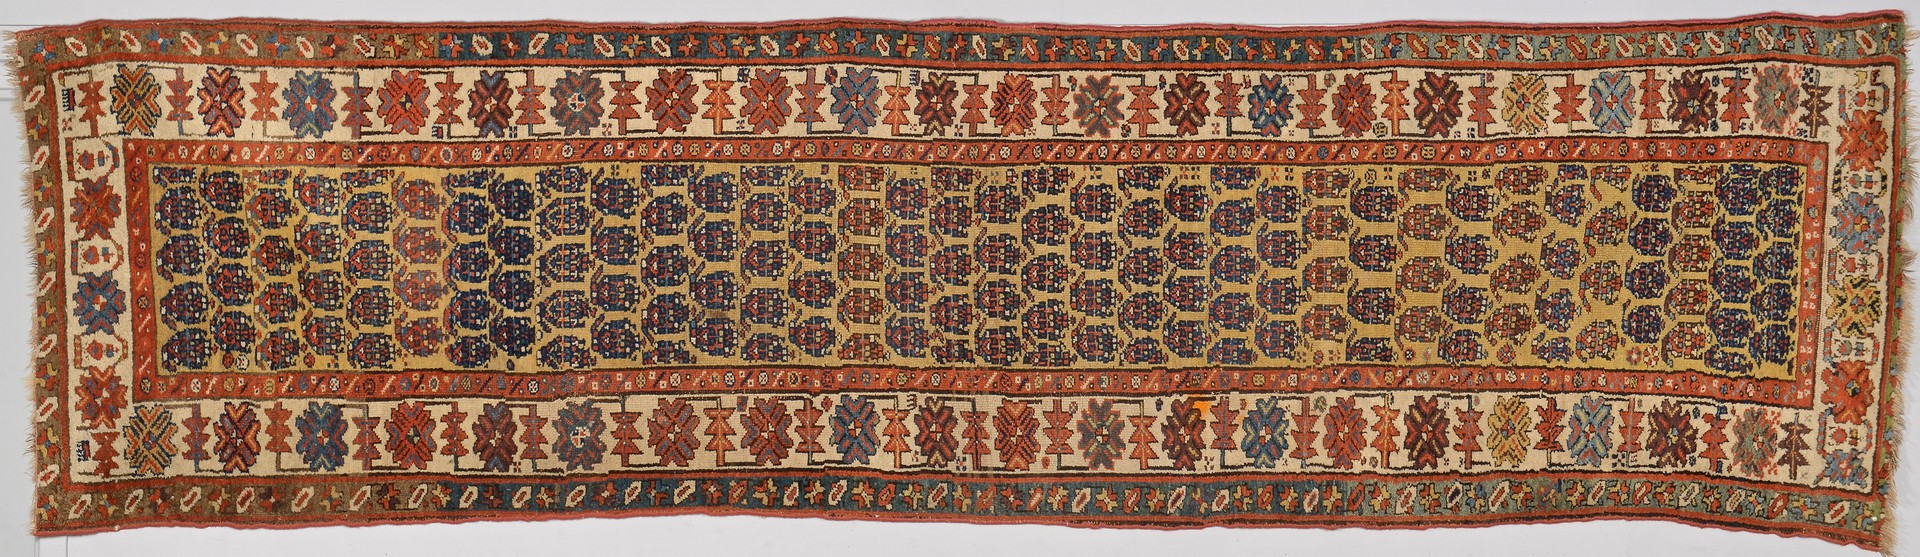 Lot 258: Antique Kurdish Runner